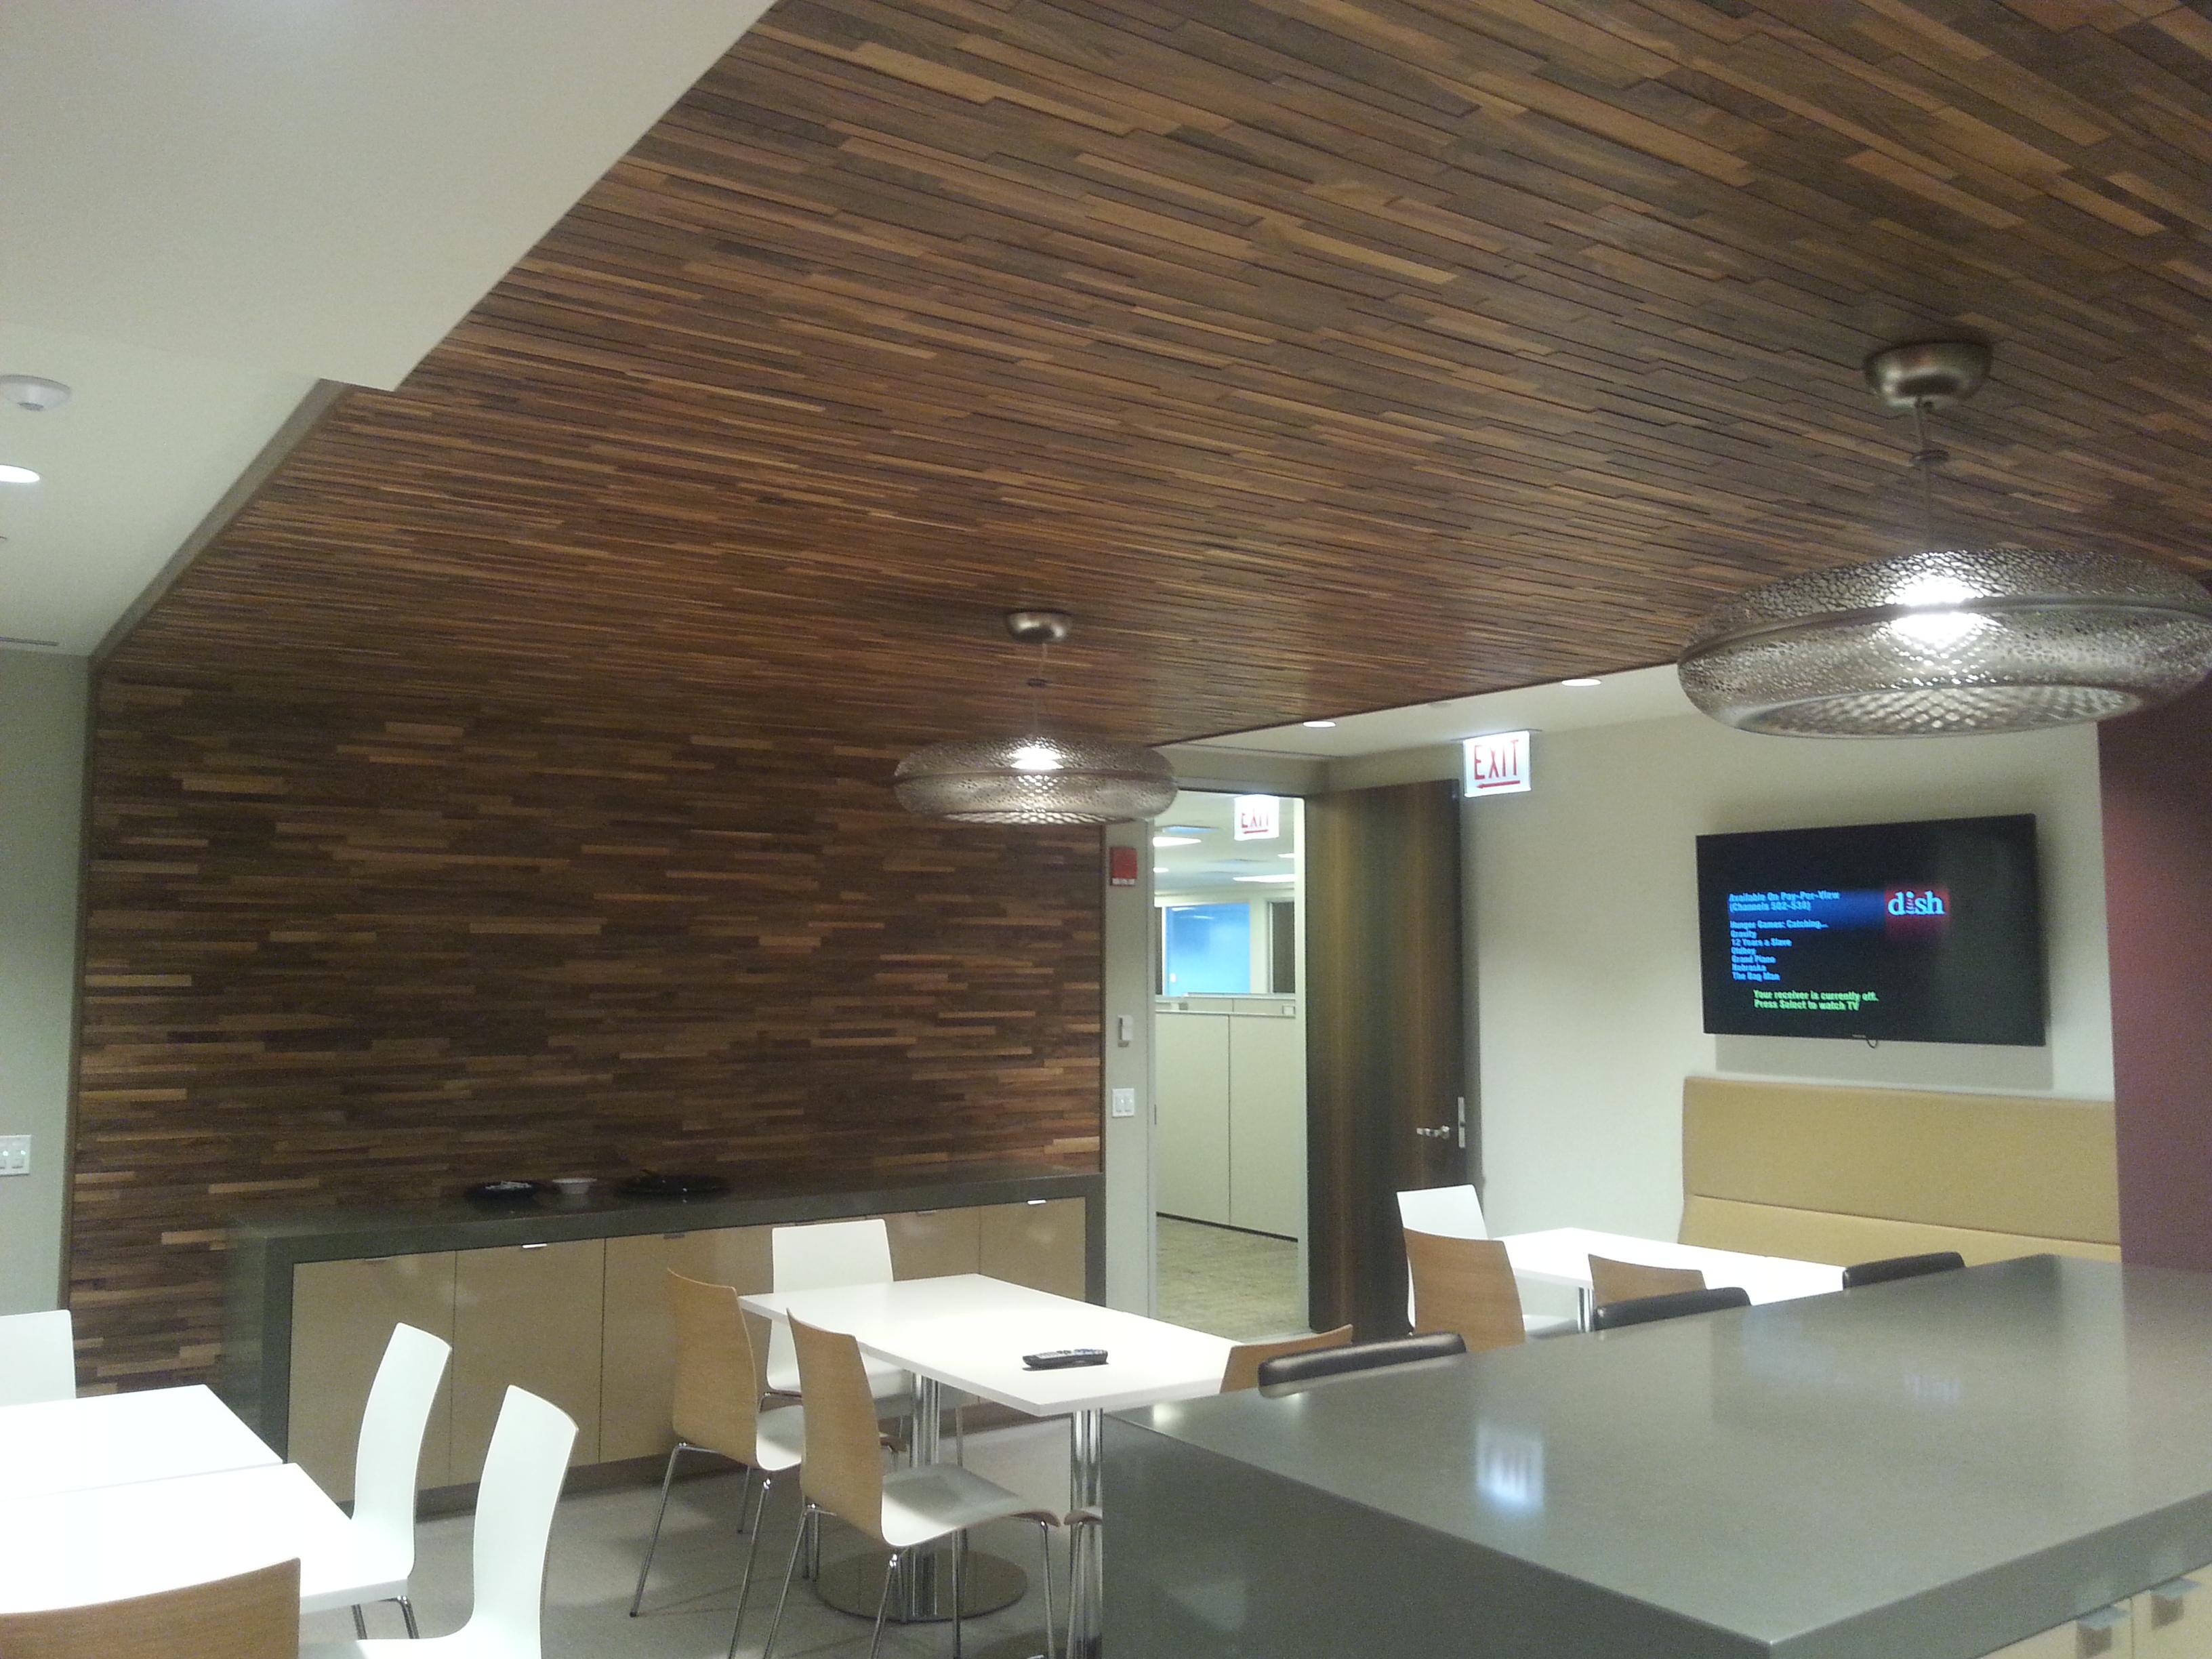 Walnut Cafe Ceiling #2